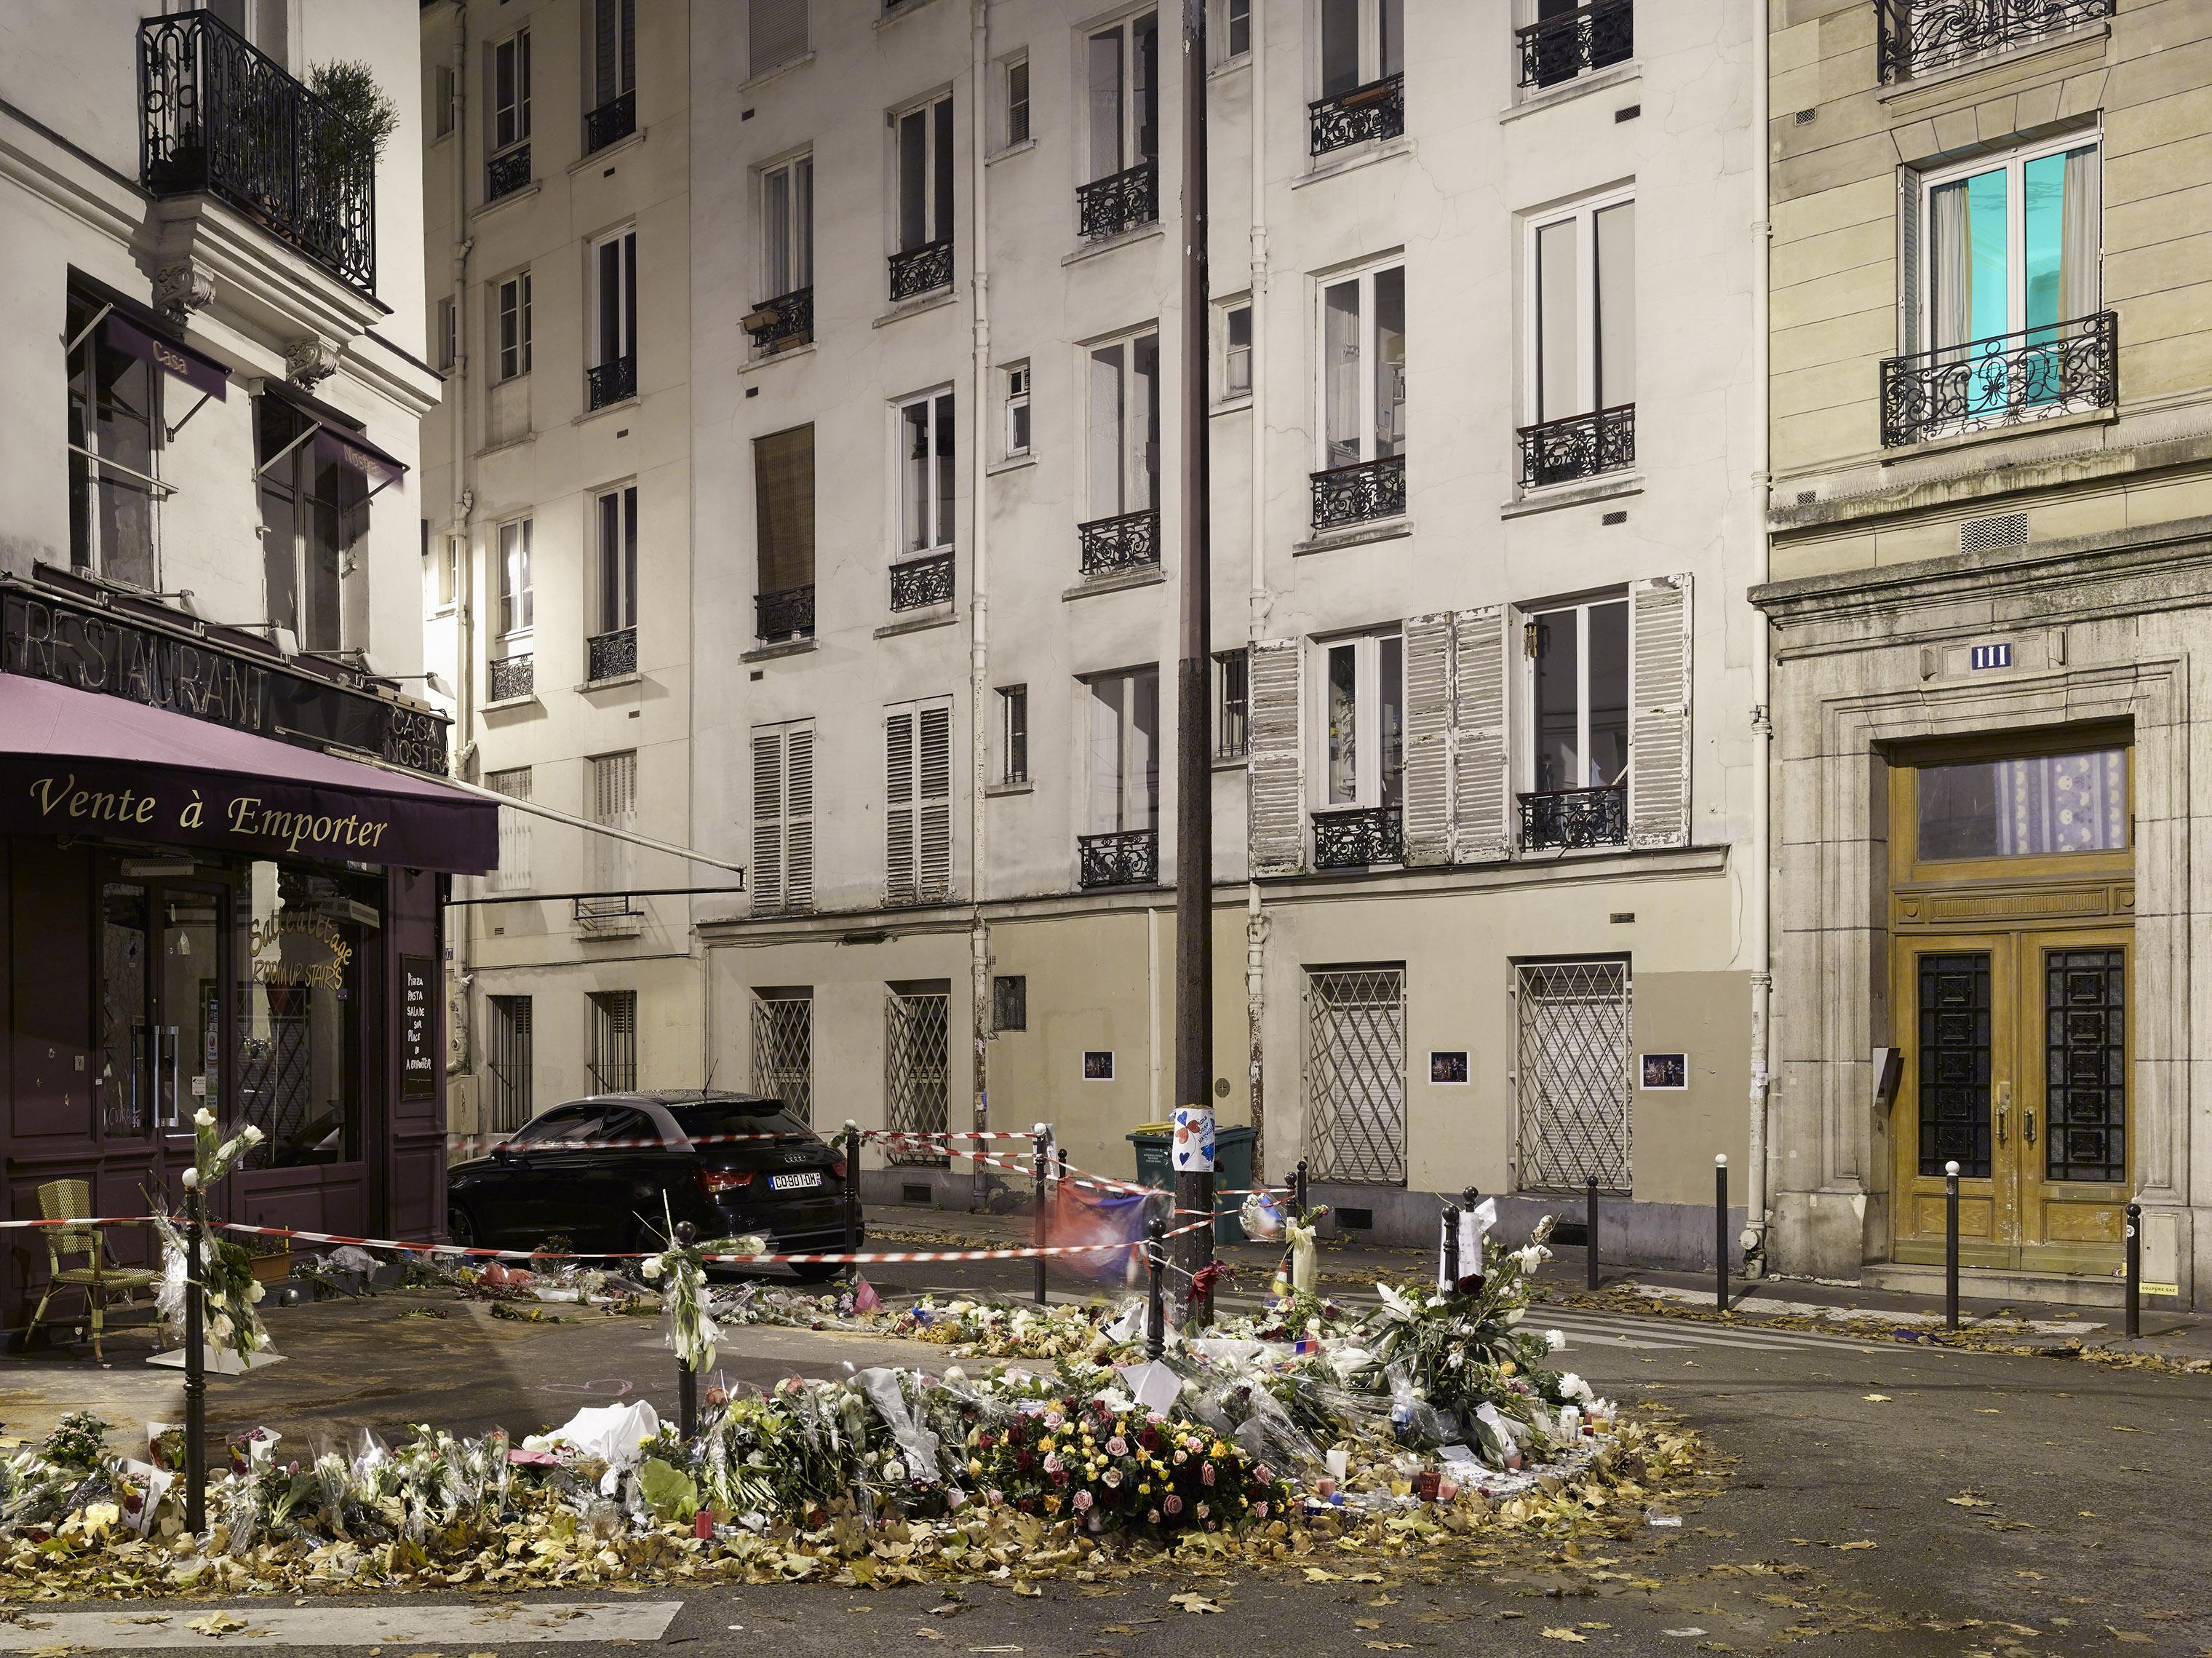 A memorial on the Rue de la Fontaine-au-Roi, in the aftermath of the terror attacks, in Paris on Nov. 18, 2015.